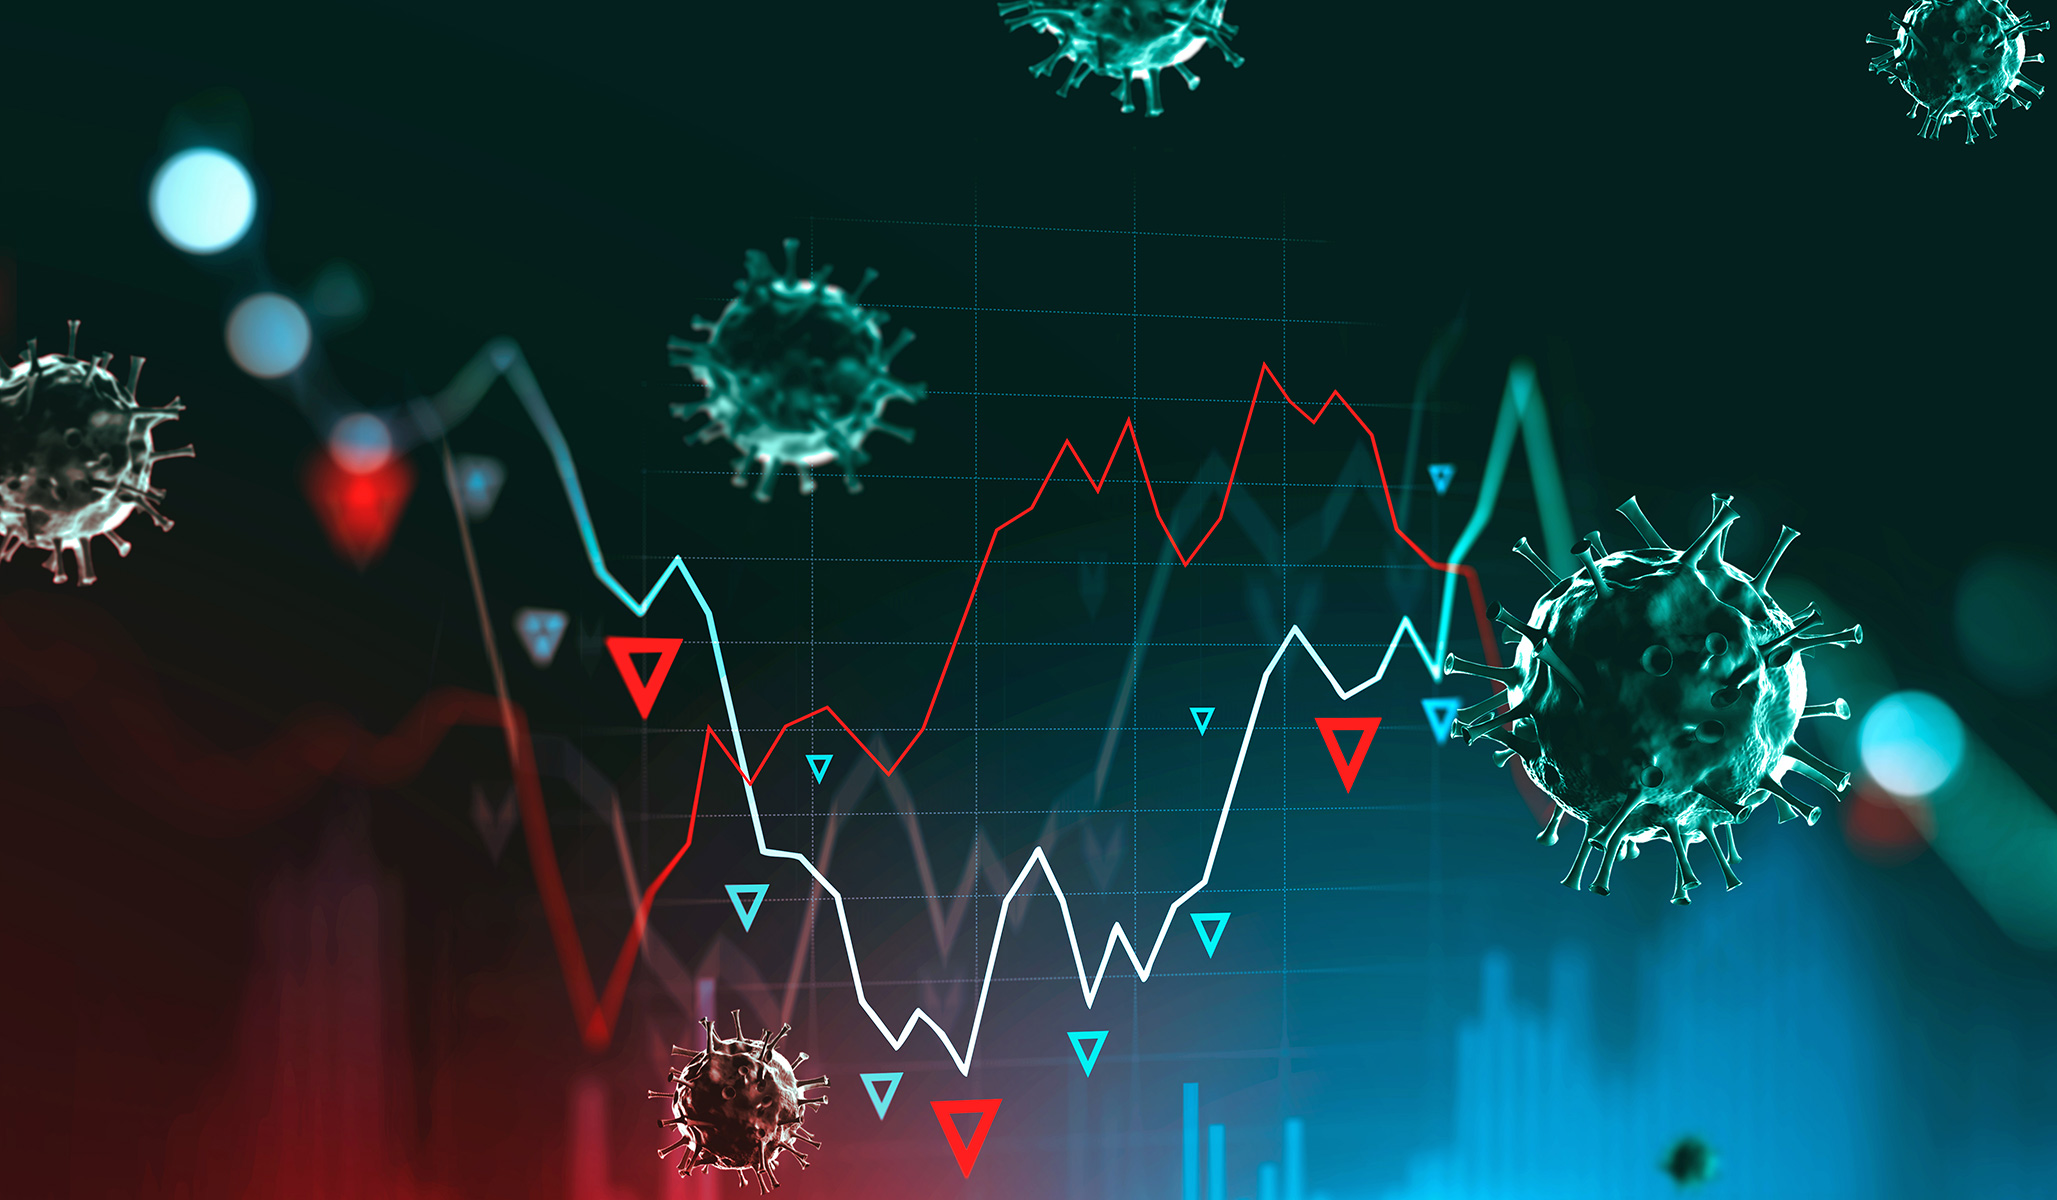 nationalreview.com - Jim Geraghty - Is the U.S. Economy Headed Toward a Recession?